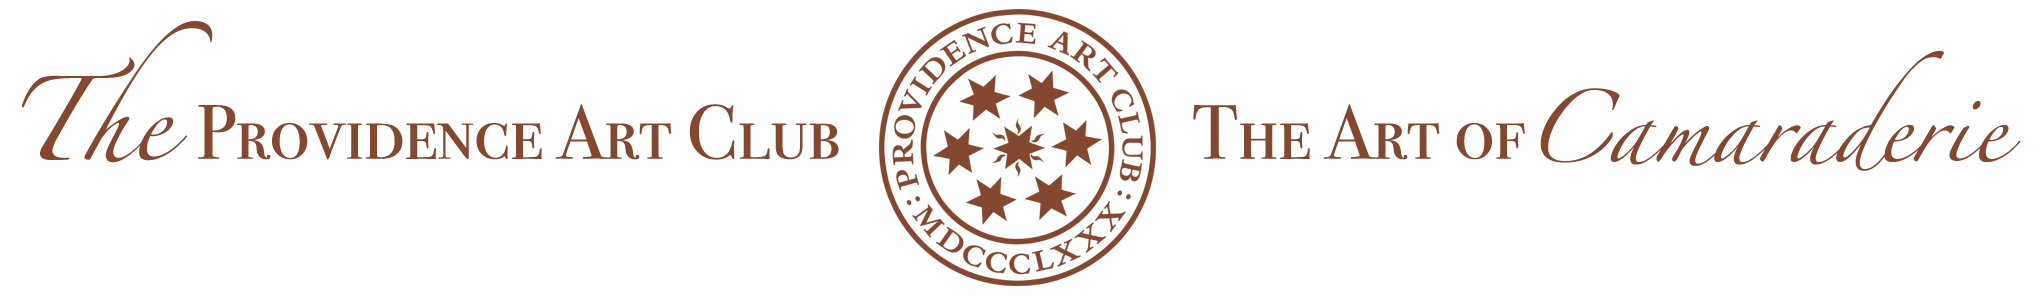 Providence Art Club